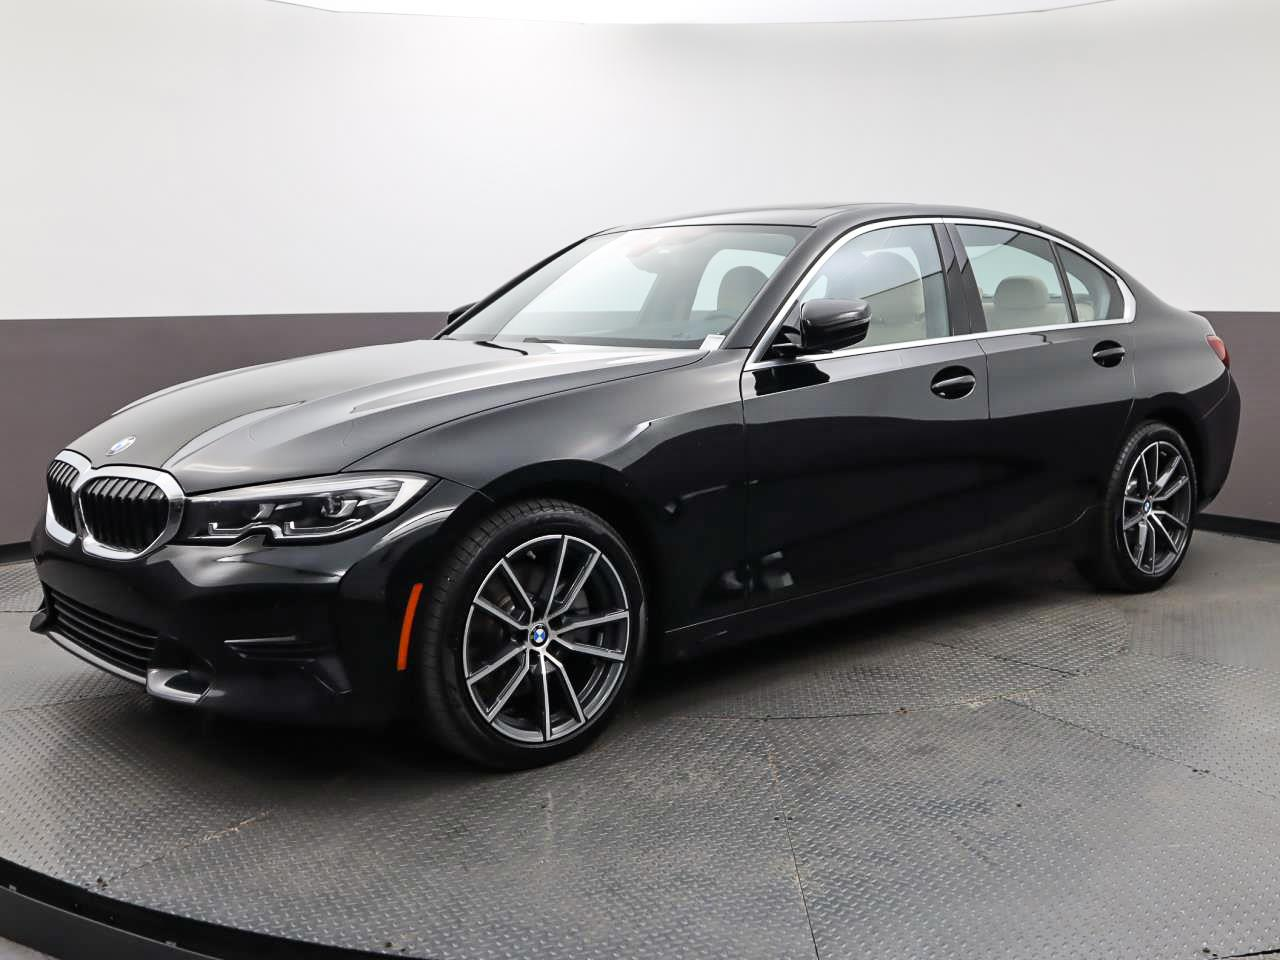 Used BMW 3-SERIES 2019 MIAMI 330I